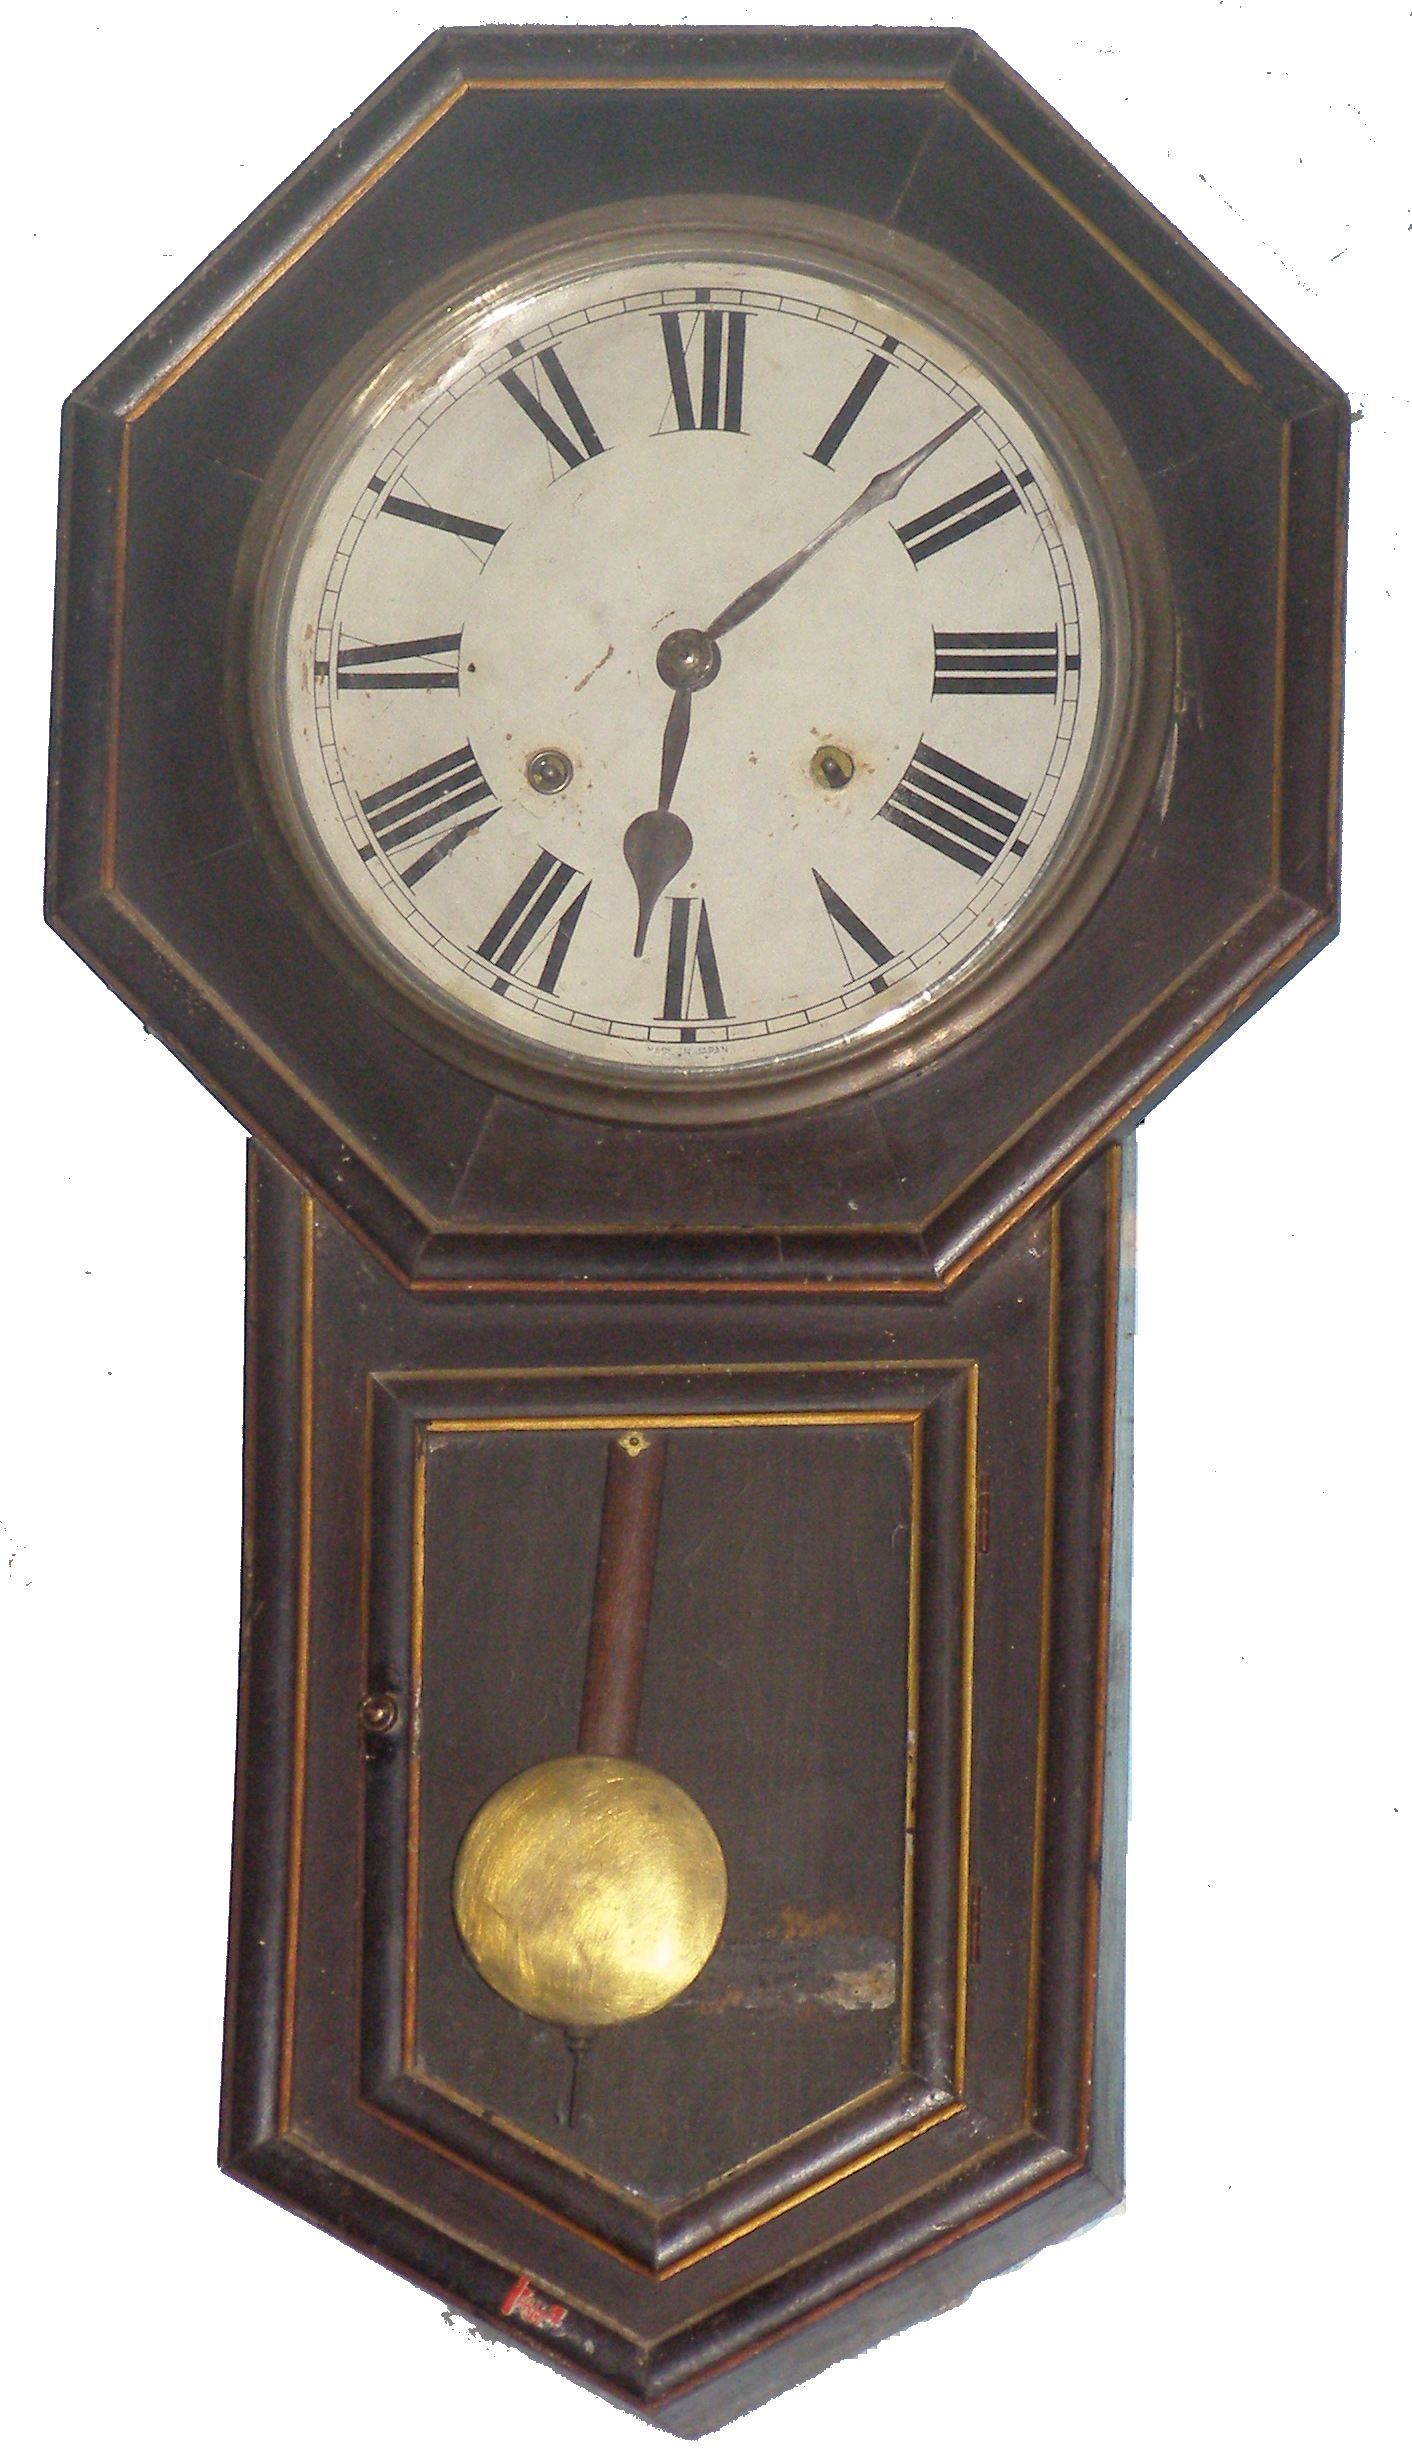 Fileold pendulum clockg wikimedia commons fileold pendulum clockg amipublicfo Images